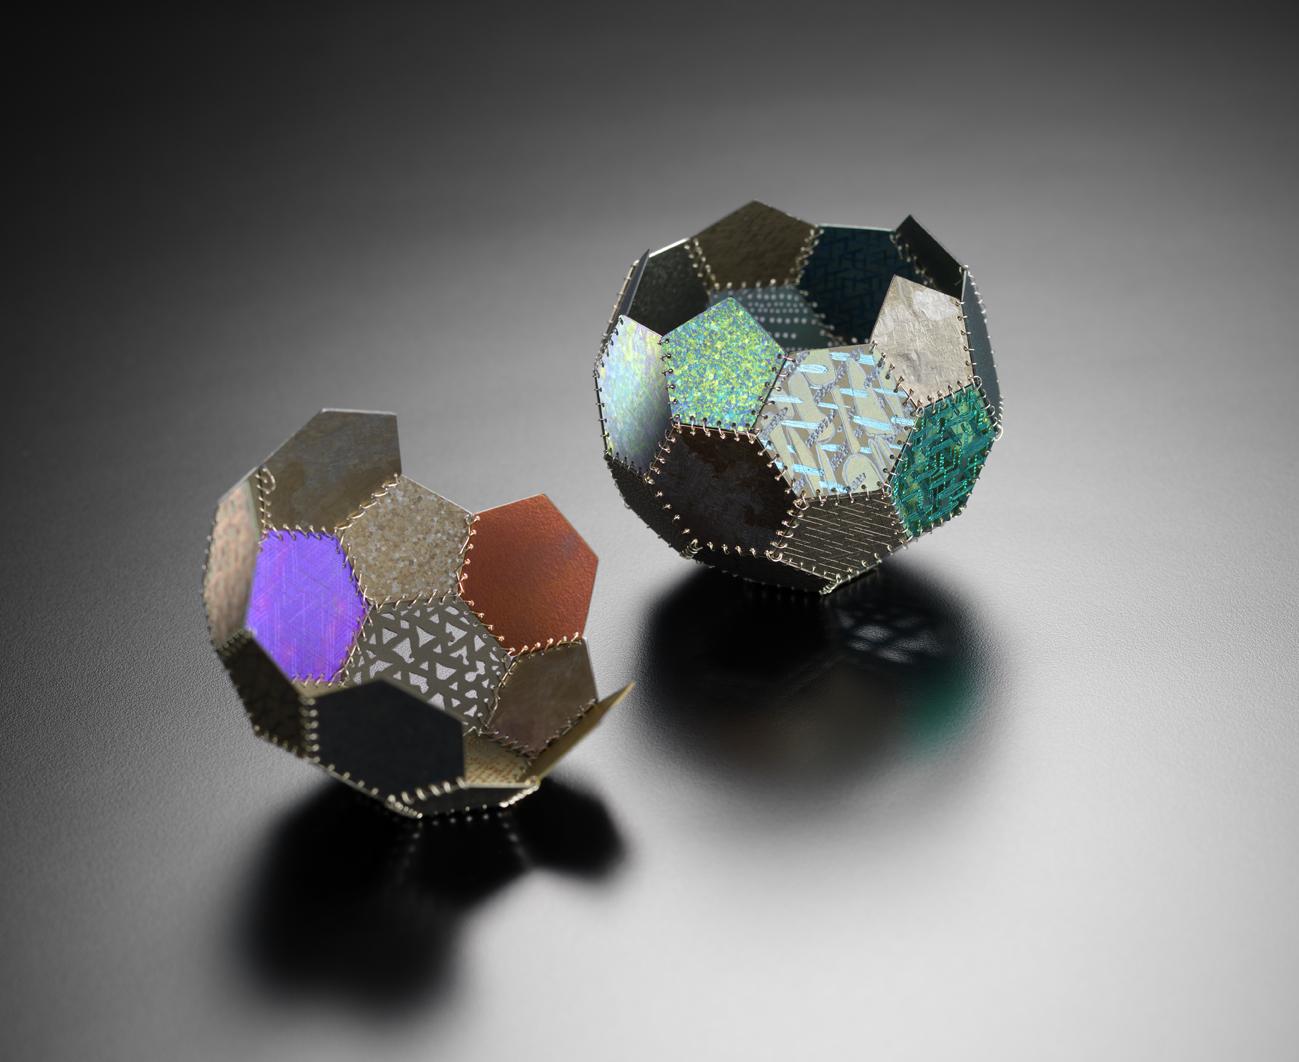 titanium jewellery art O'Rourke